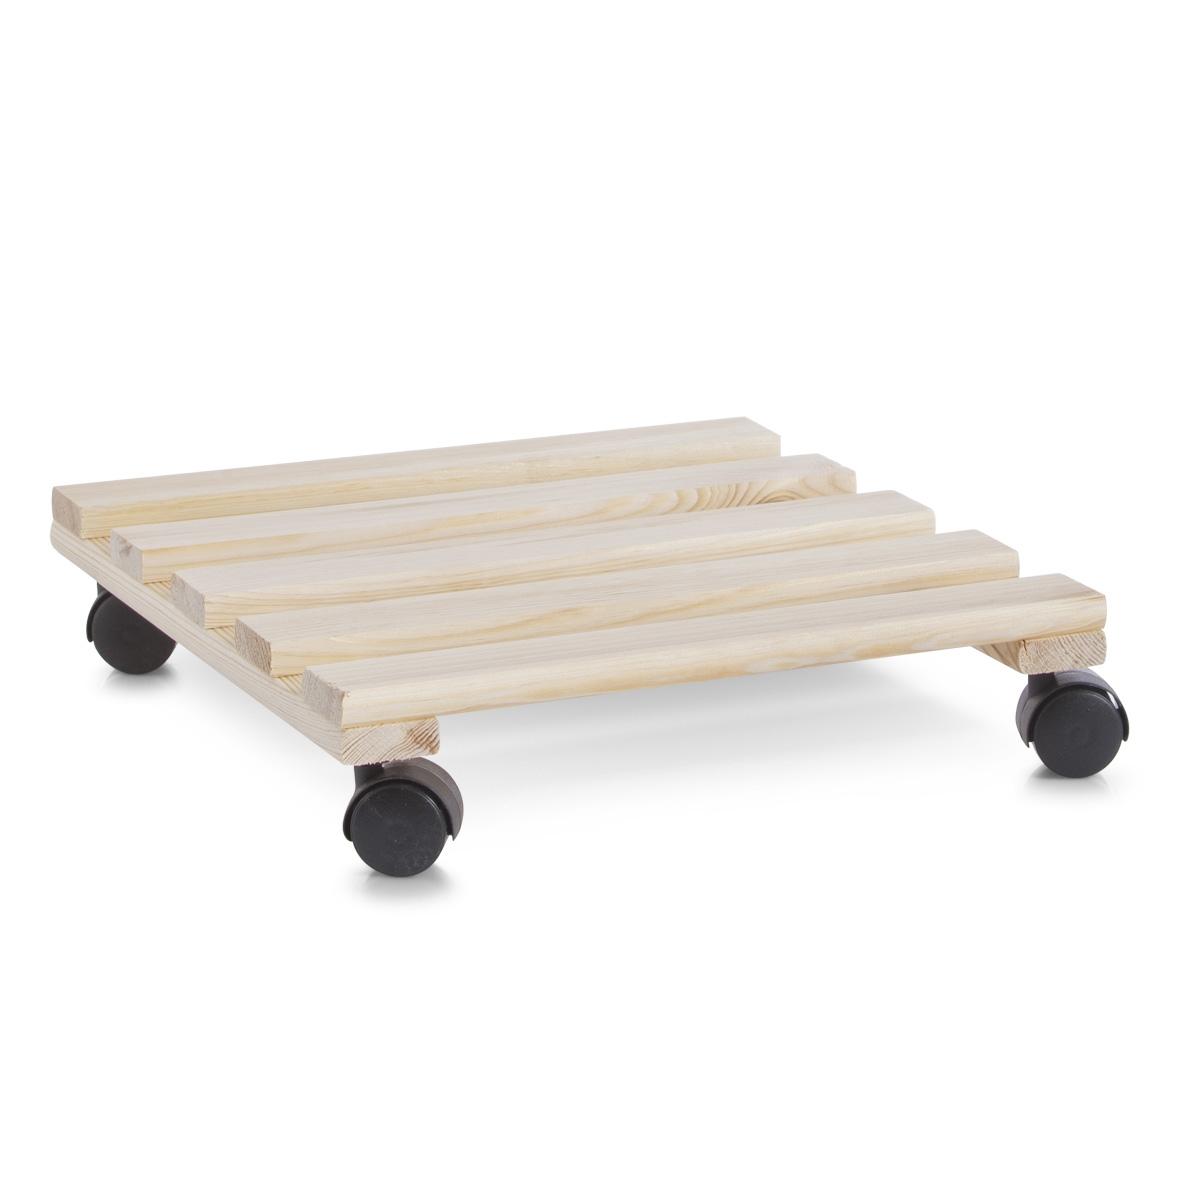 Suport pe roti pentru ghiveci, din lemn de pin, Plantoller Square Natural, l36xA36 cm